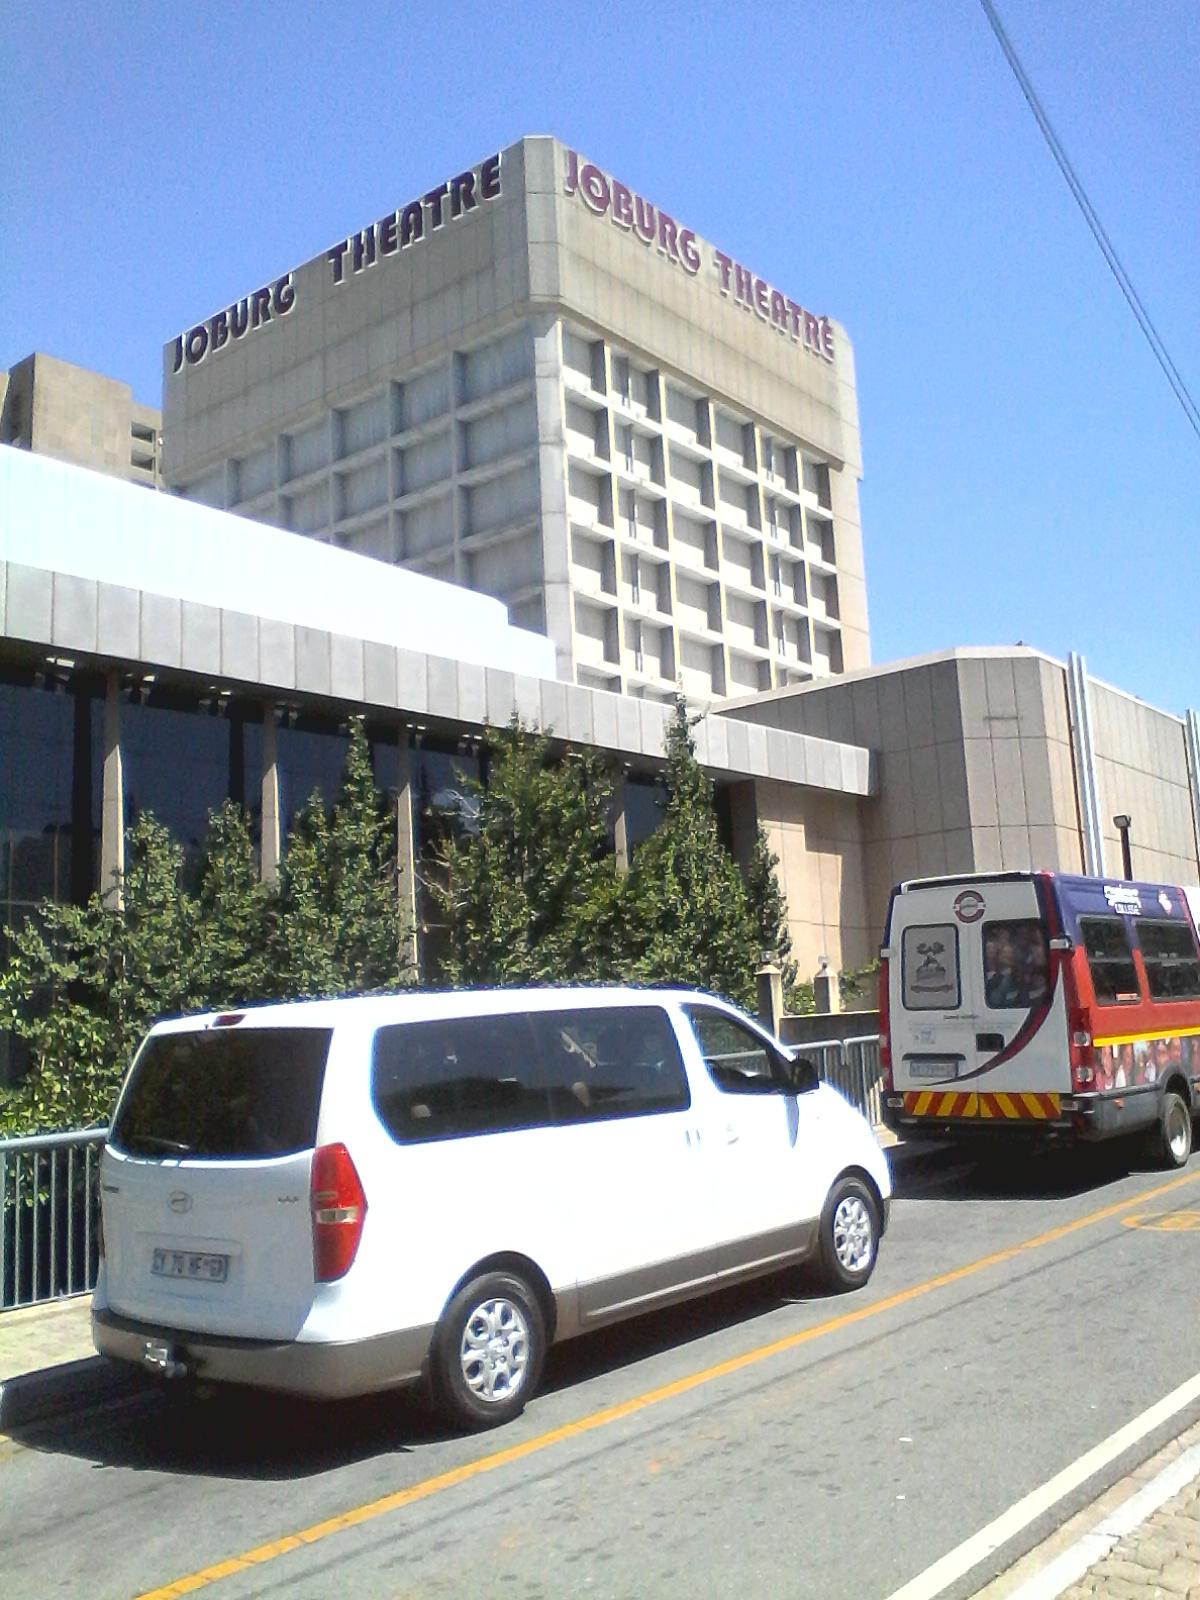 Lukunda travel services / Tour operators